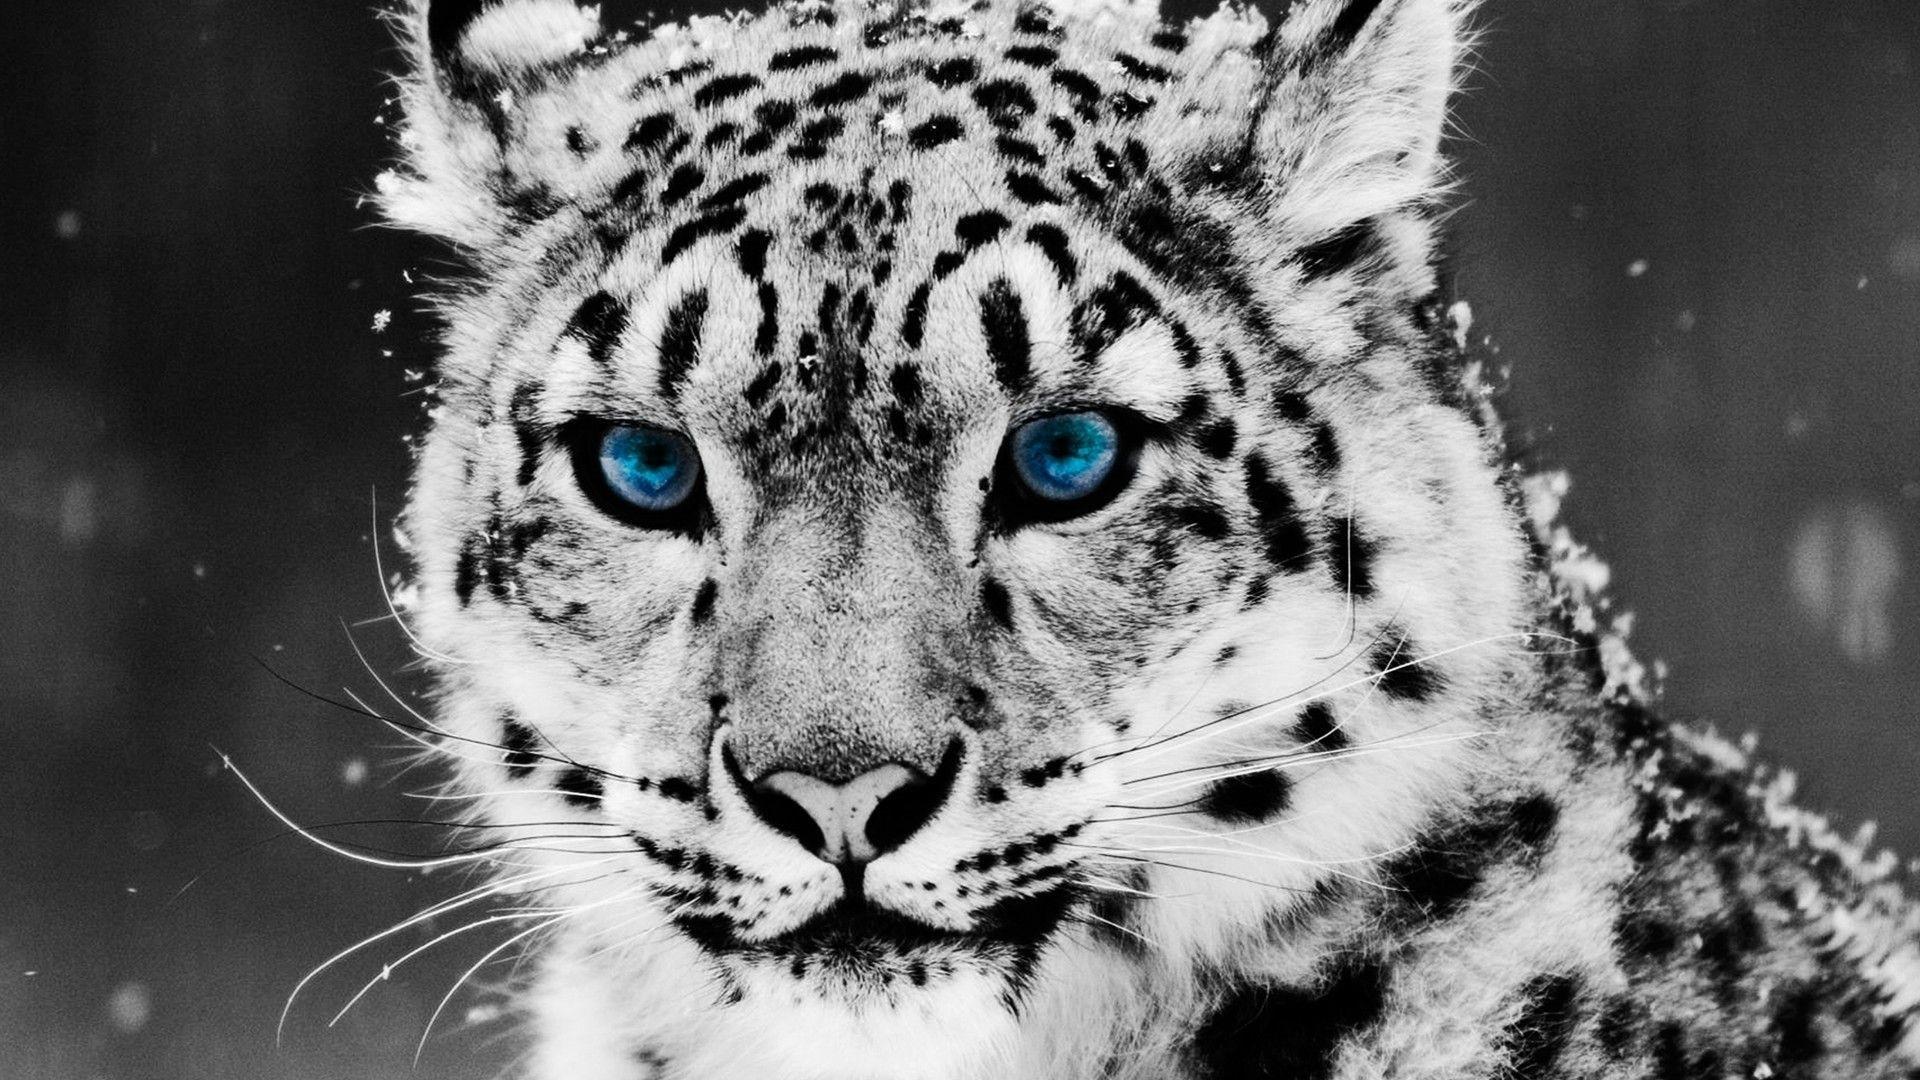 … cool tiger wallpaper hd tiger desktop wallpaper best images …